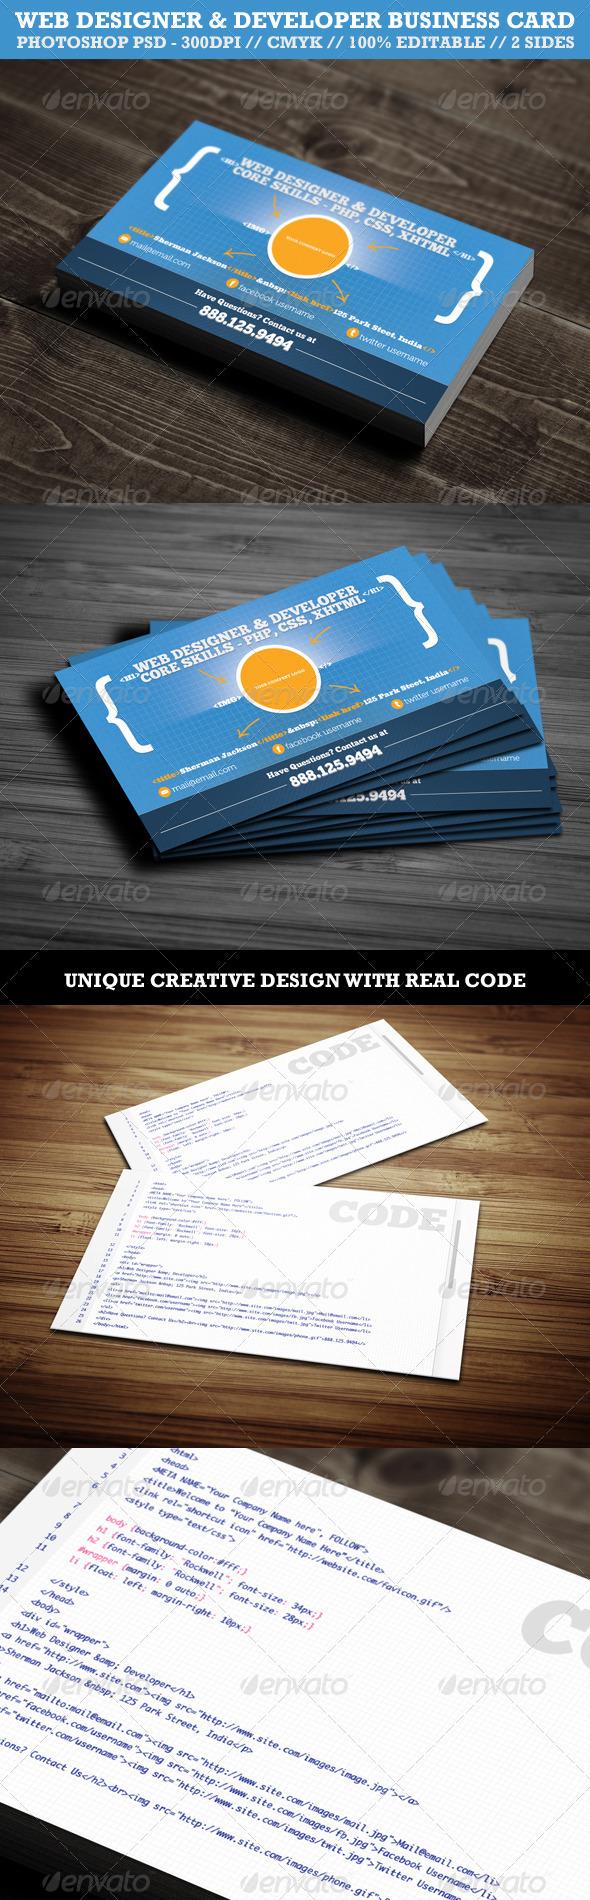 Creative web designerdeveloper business card by shermanjackson creative web designerdeveloper business card creative business cards magicingreecefo Choice Image